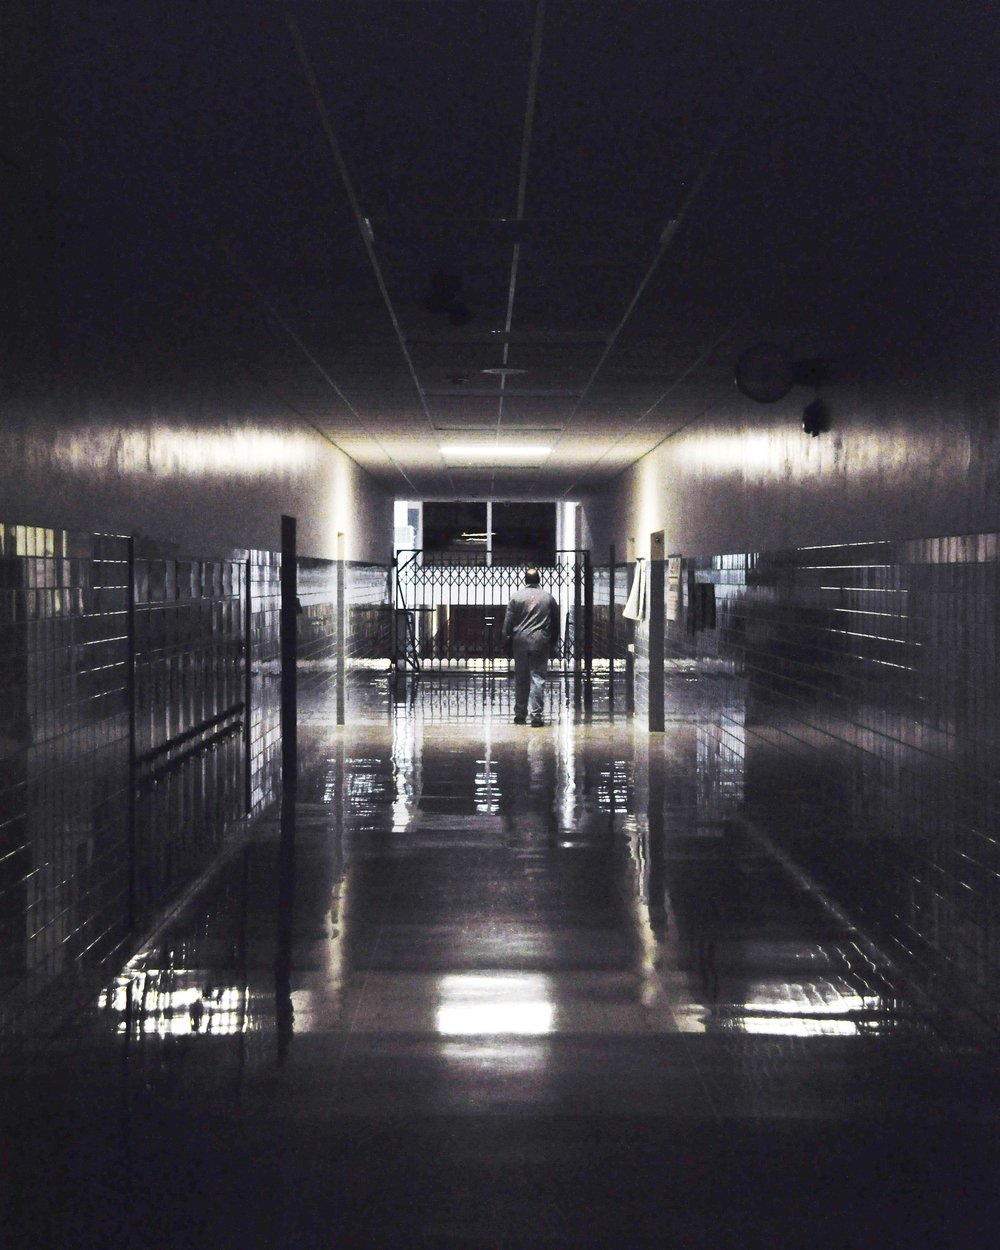 Nighttime Janitor - Sharpened.jpg